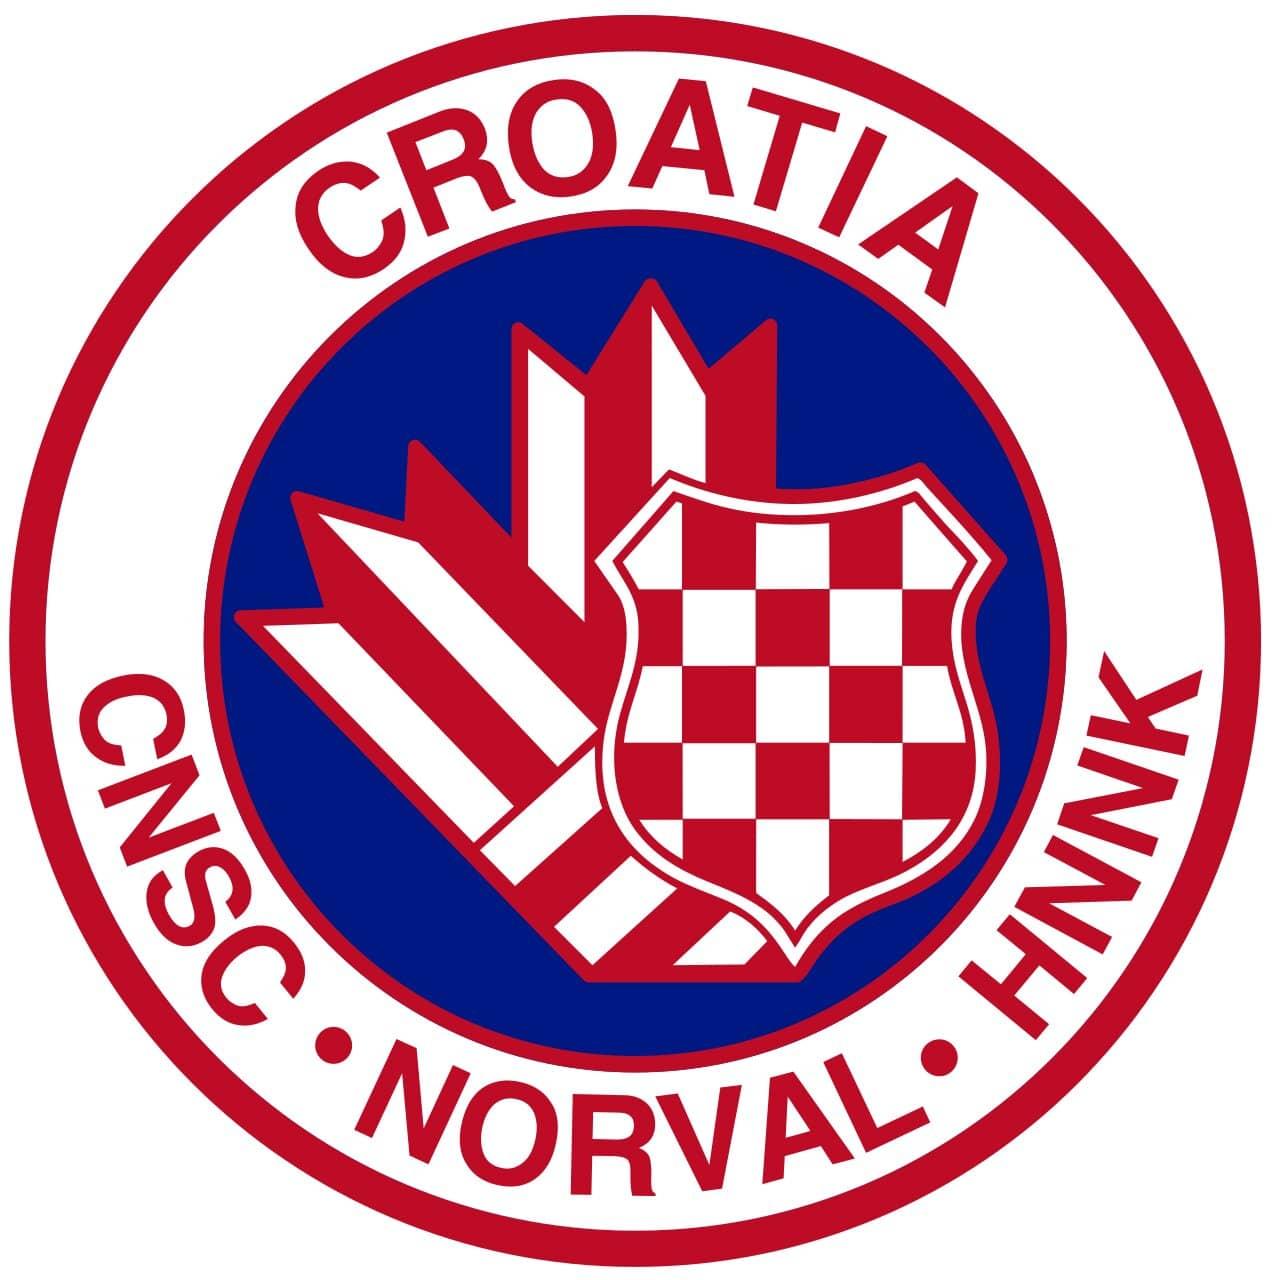 CROATIA NORVAL SC